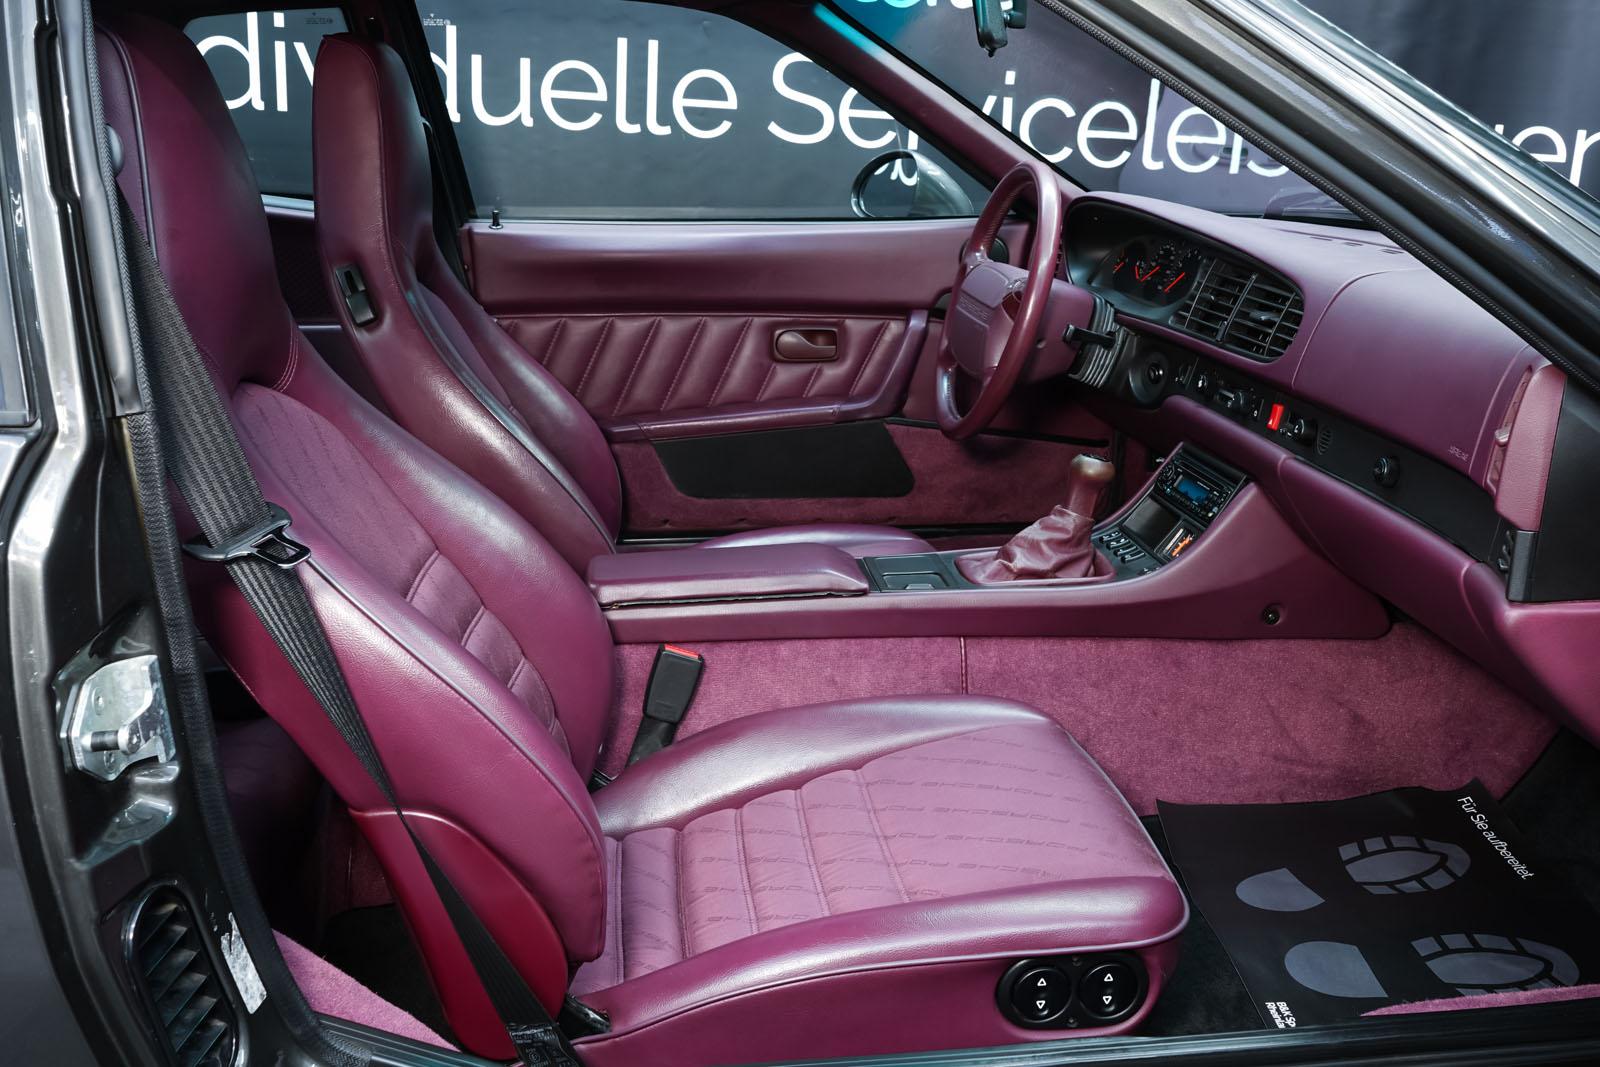 Porsche_986_Targa_Grau_Pink_POR-1092_15_w